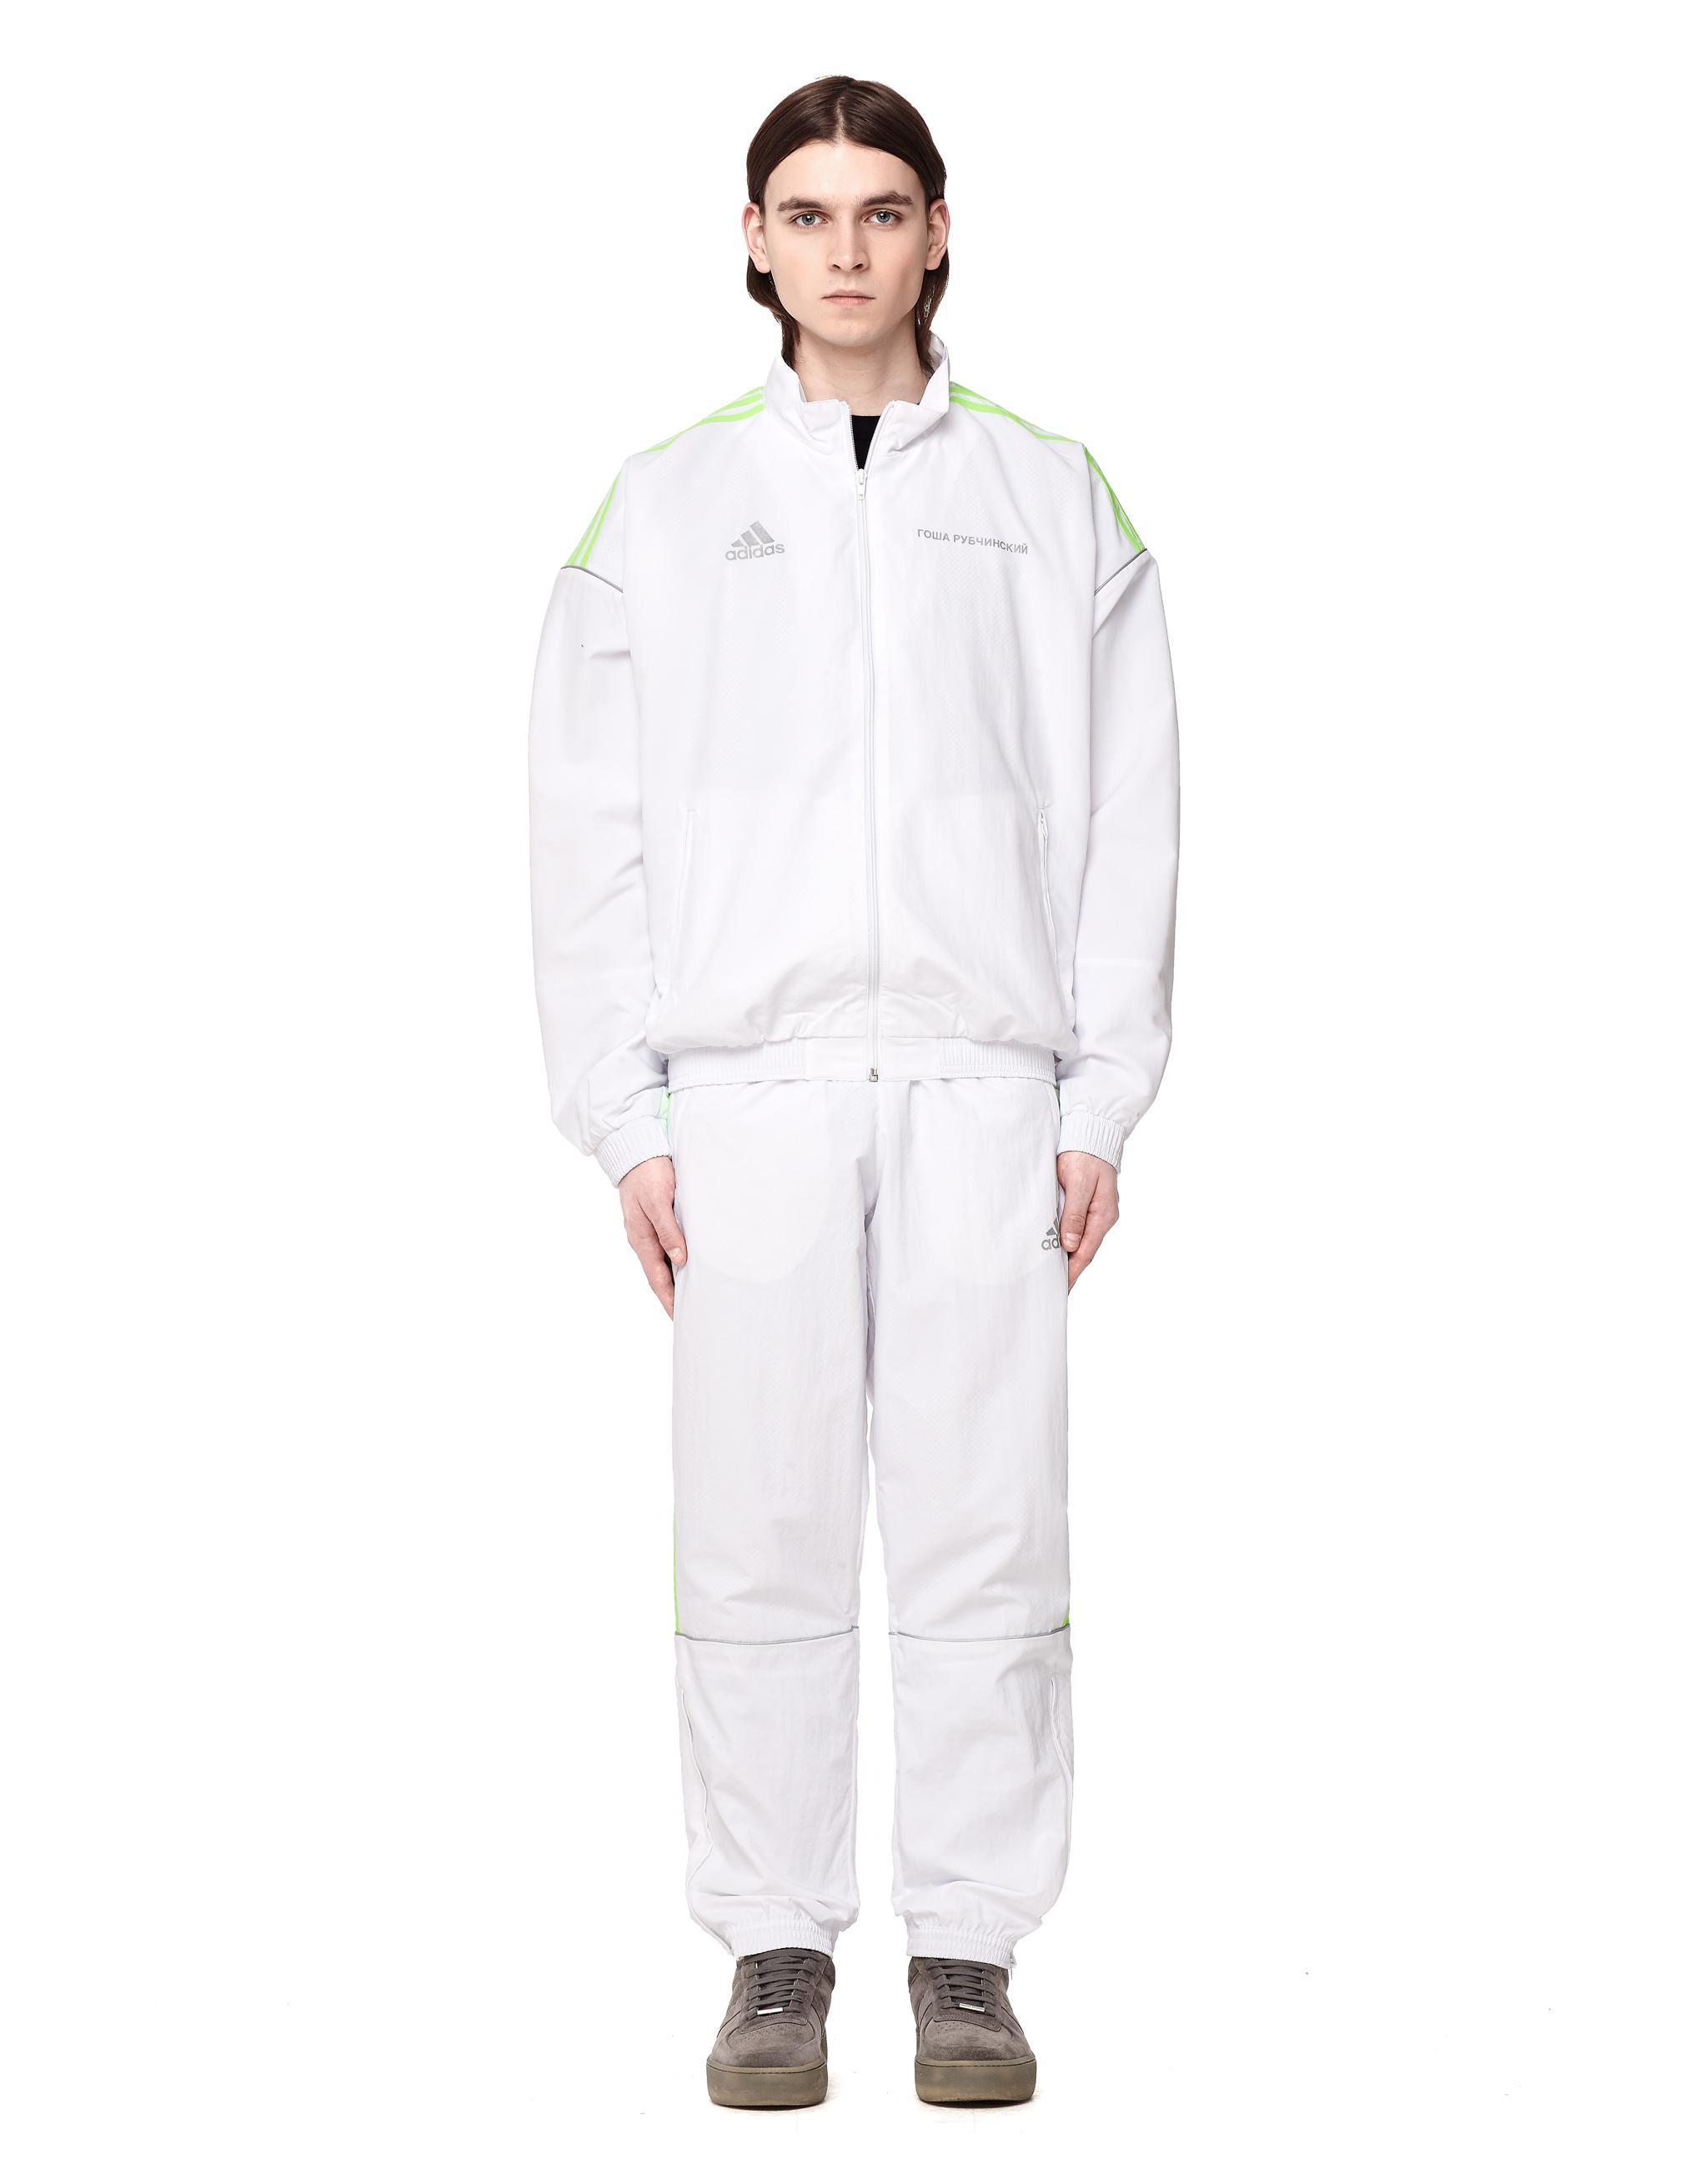 Lyst georgij rubchinskiy adidas chaqueta georgij de en deporte en blanco